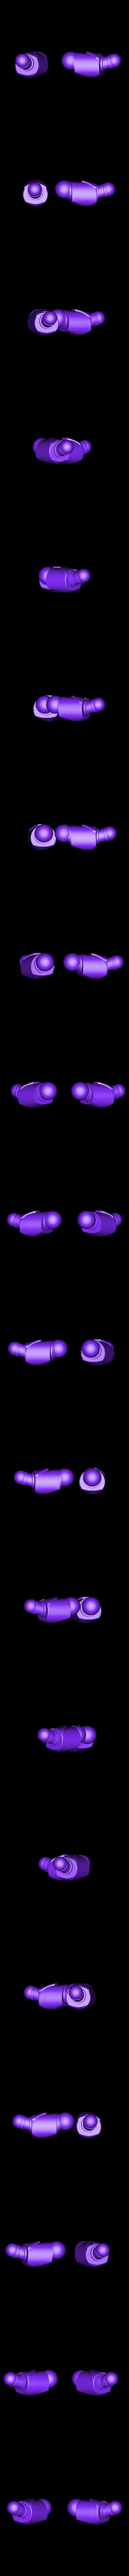 spider_legs4.stl Download free STL file Robot Spider • 3D print design, duncanshadow